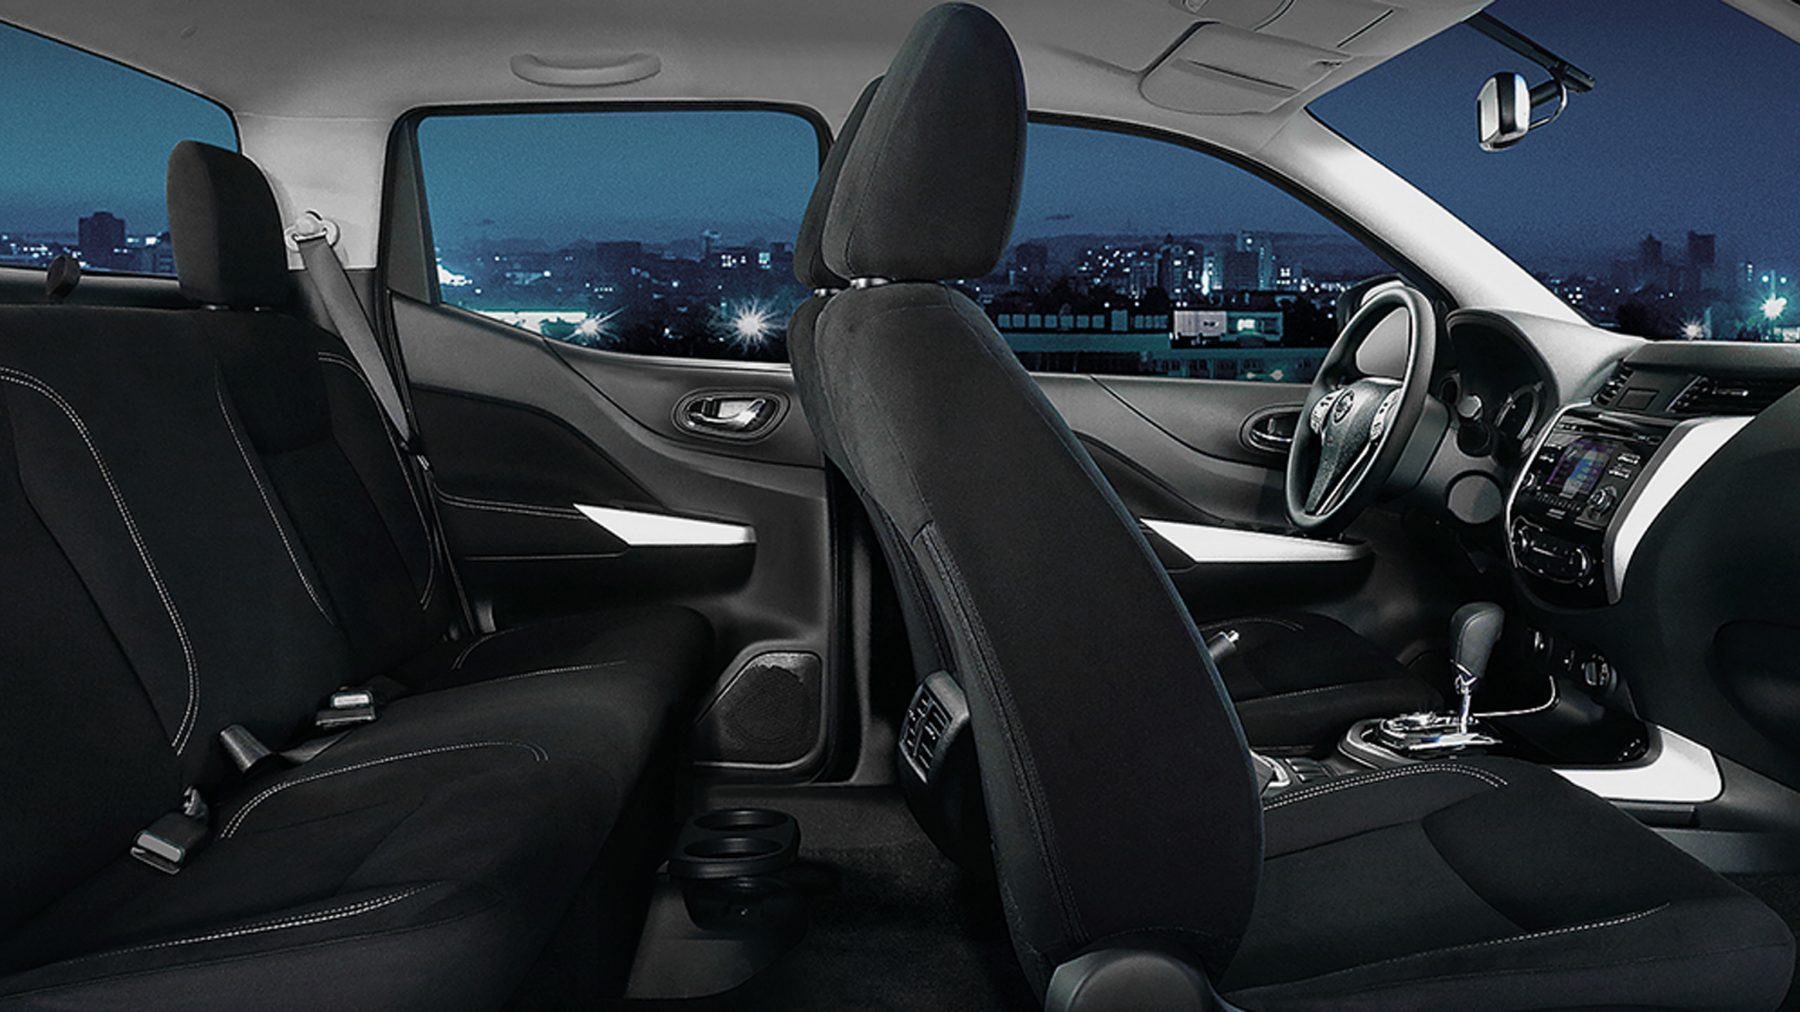 Nissan Navara Interior Seats